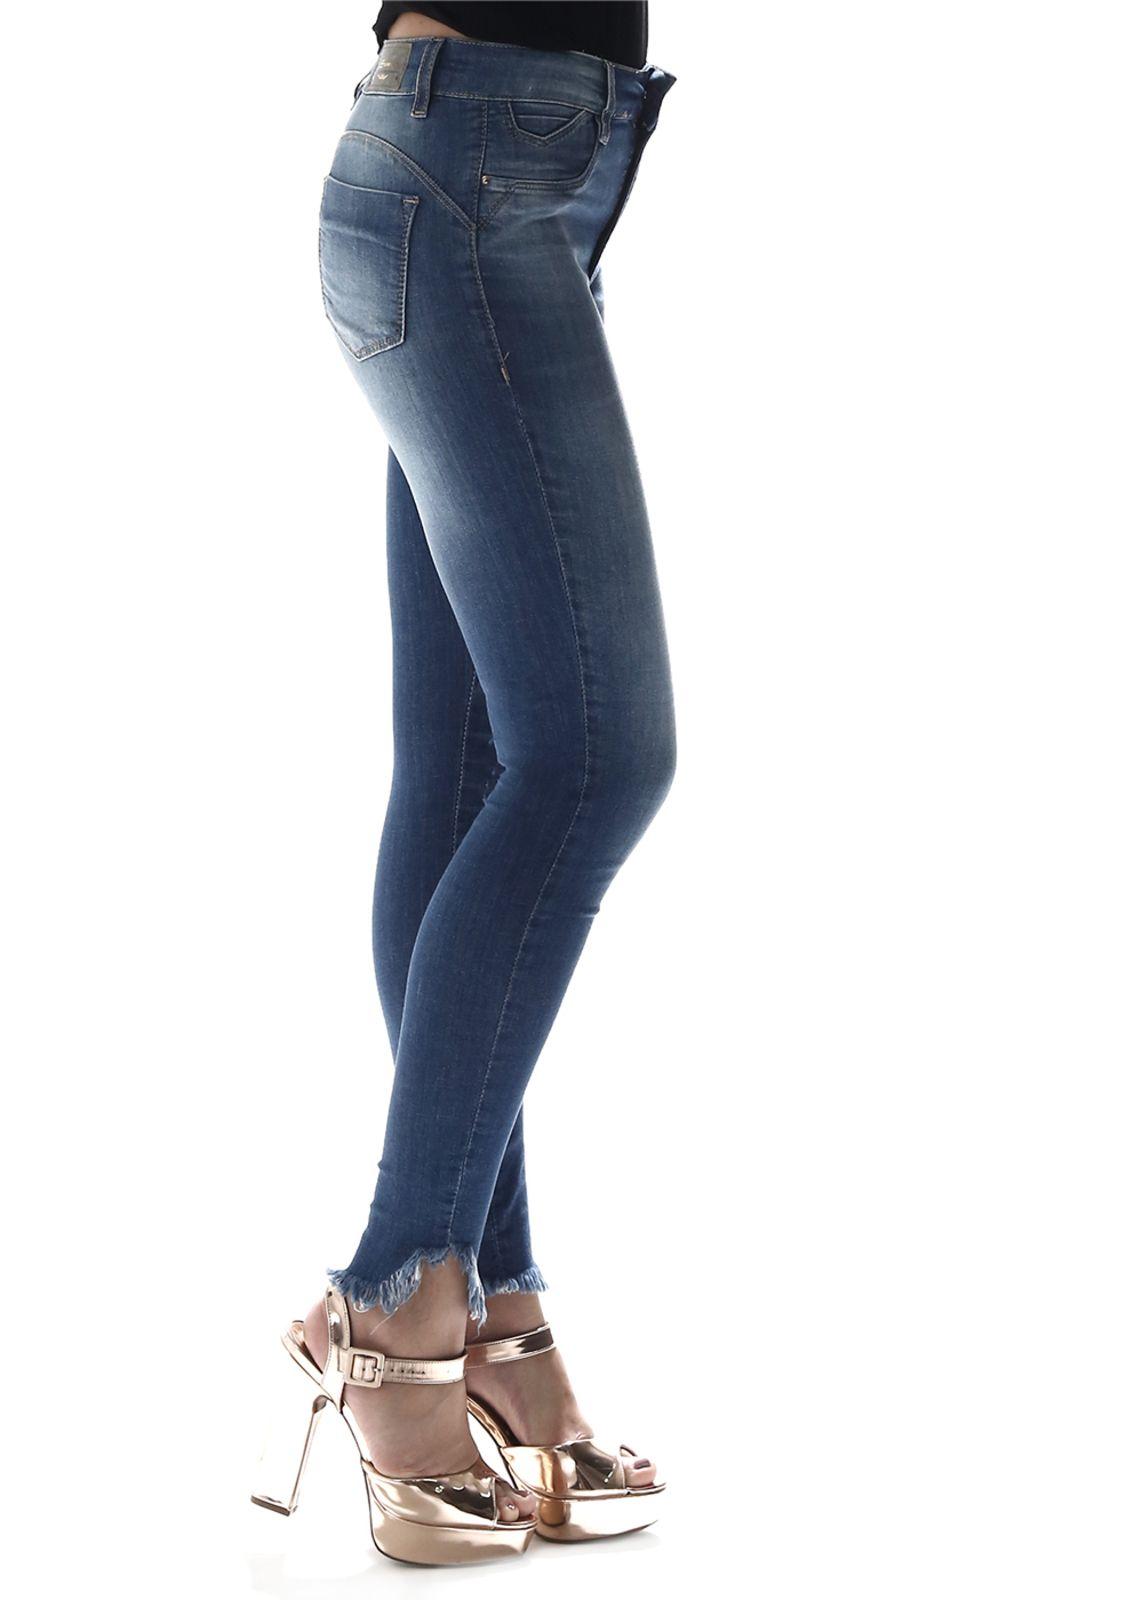 calça azul jeans cigarrete